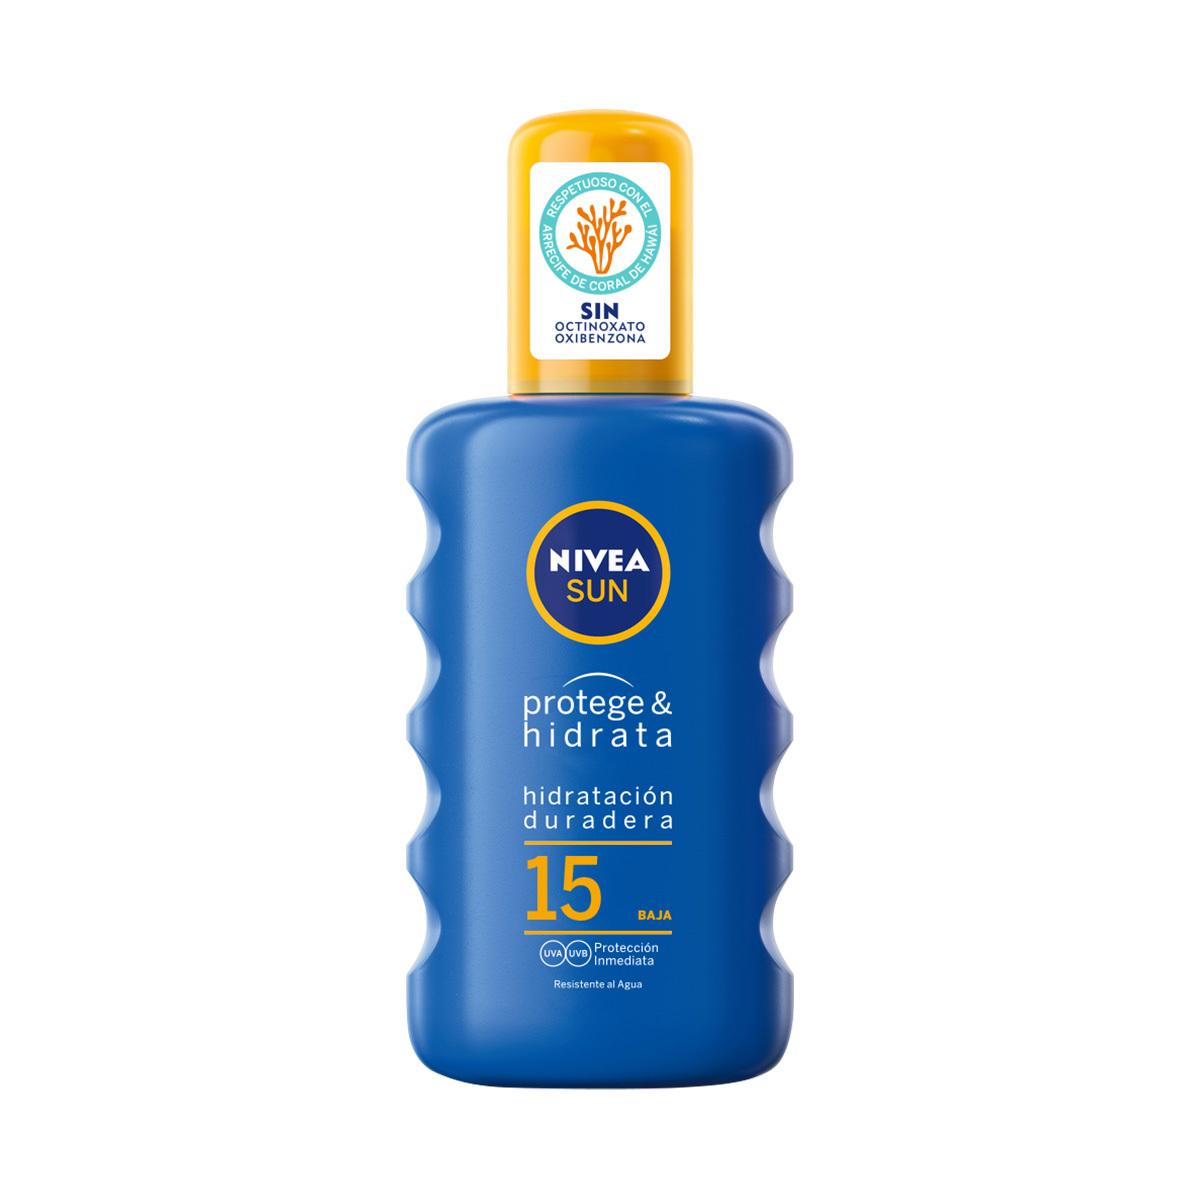 Spray Protege e hidrata SPF 15 de Nivea (13,49 euros).